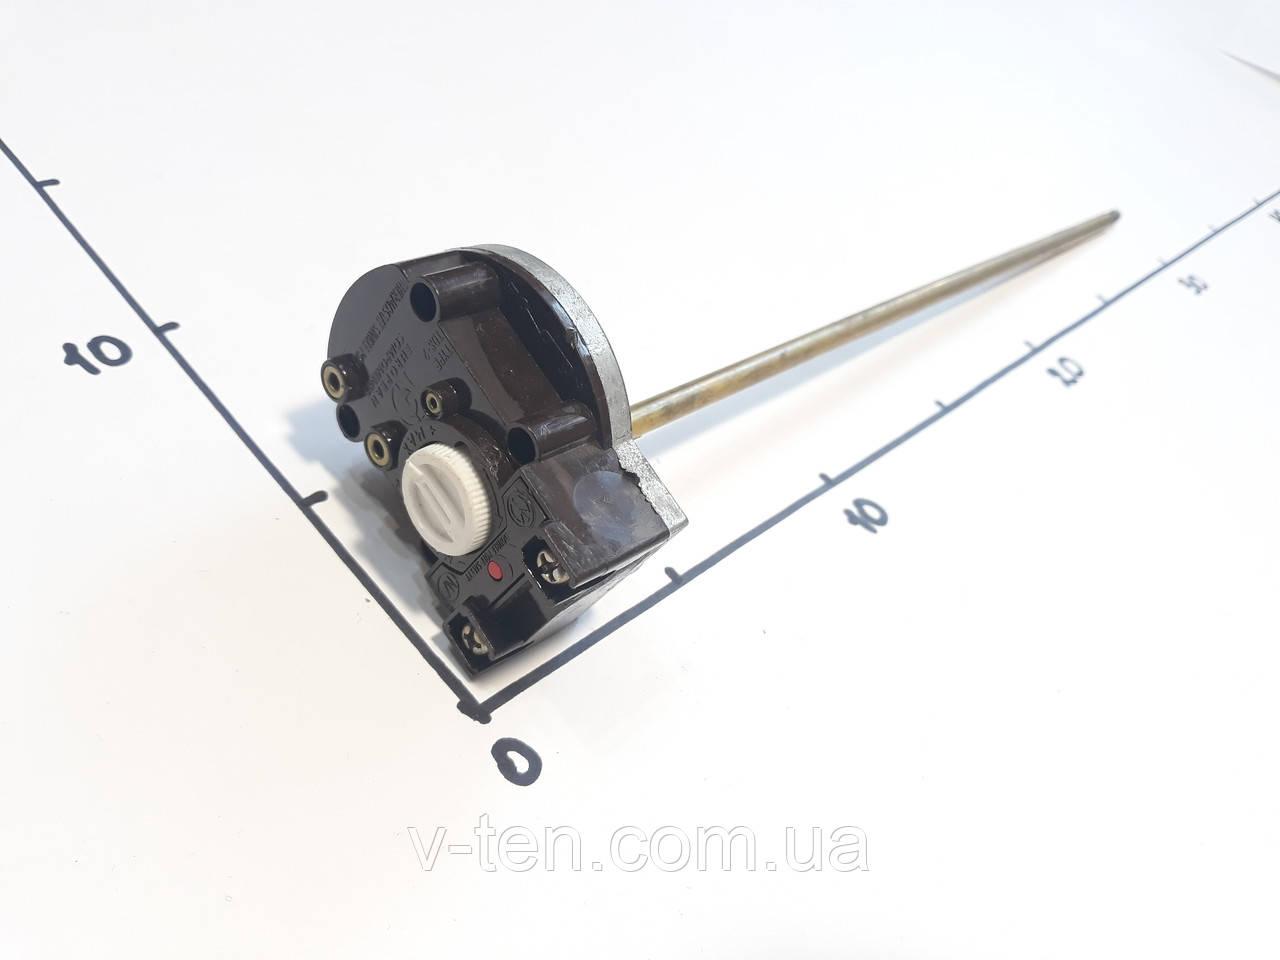 Терморегулятор для бойлера 16А із захистом European components (Італія)